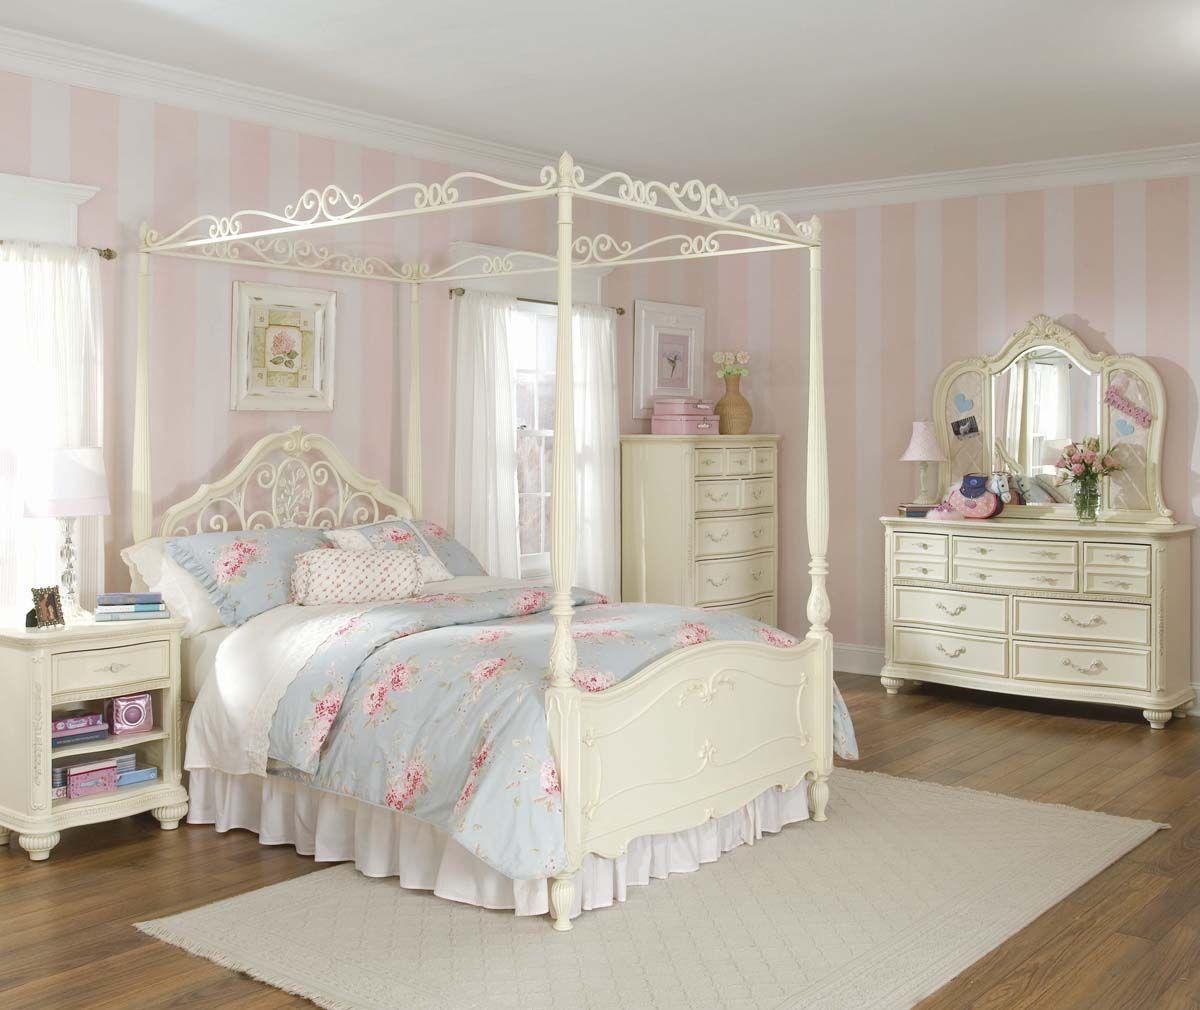 bedroom decor carpet white tiles with brown floor tiles also